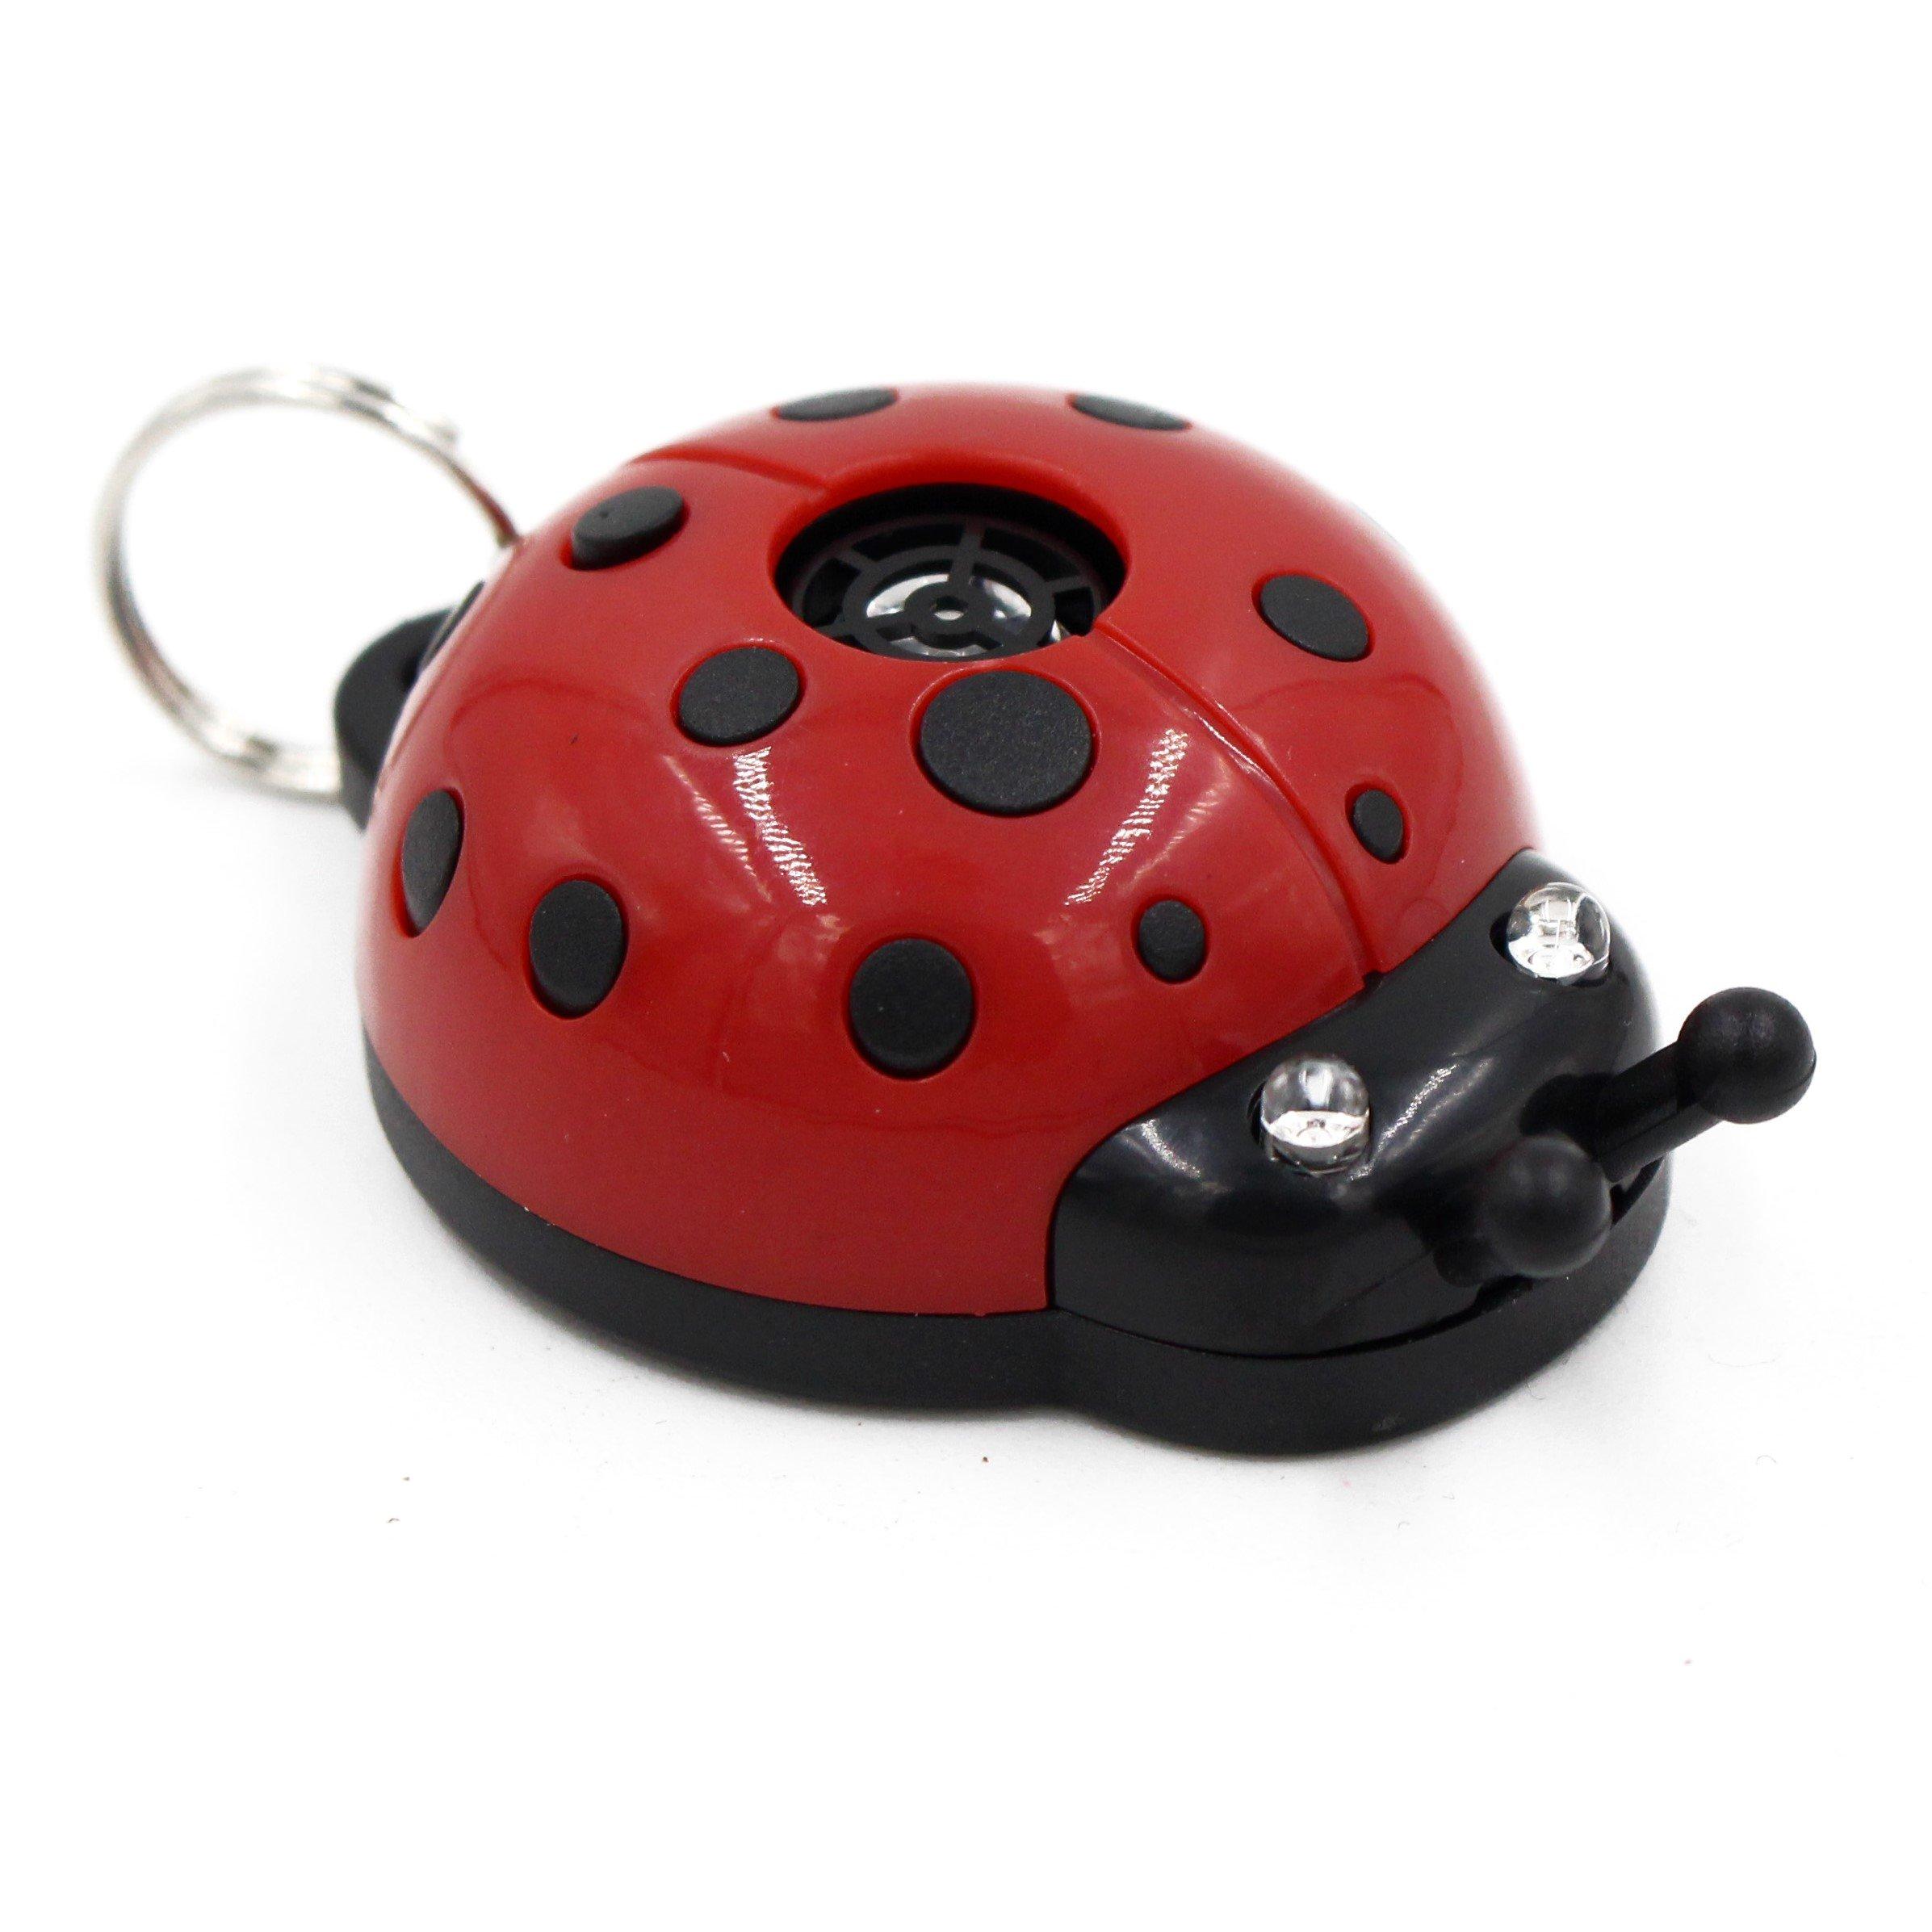 Roxy Ruff Ultrasonic Fleas and Ticks Repellent (Red Bug Collar Attachment)